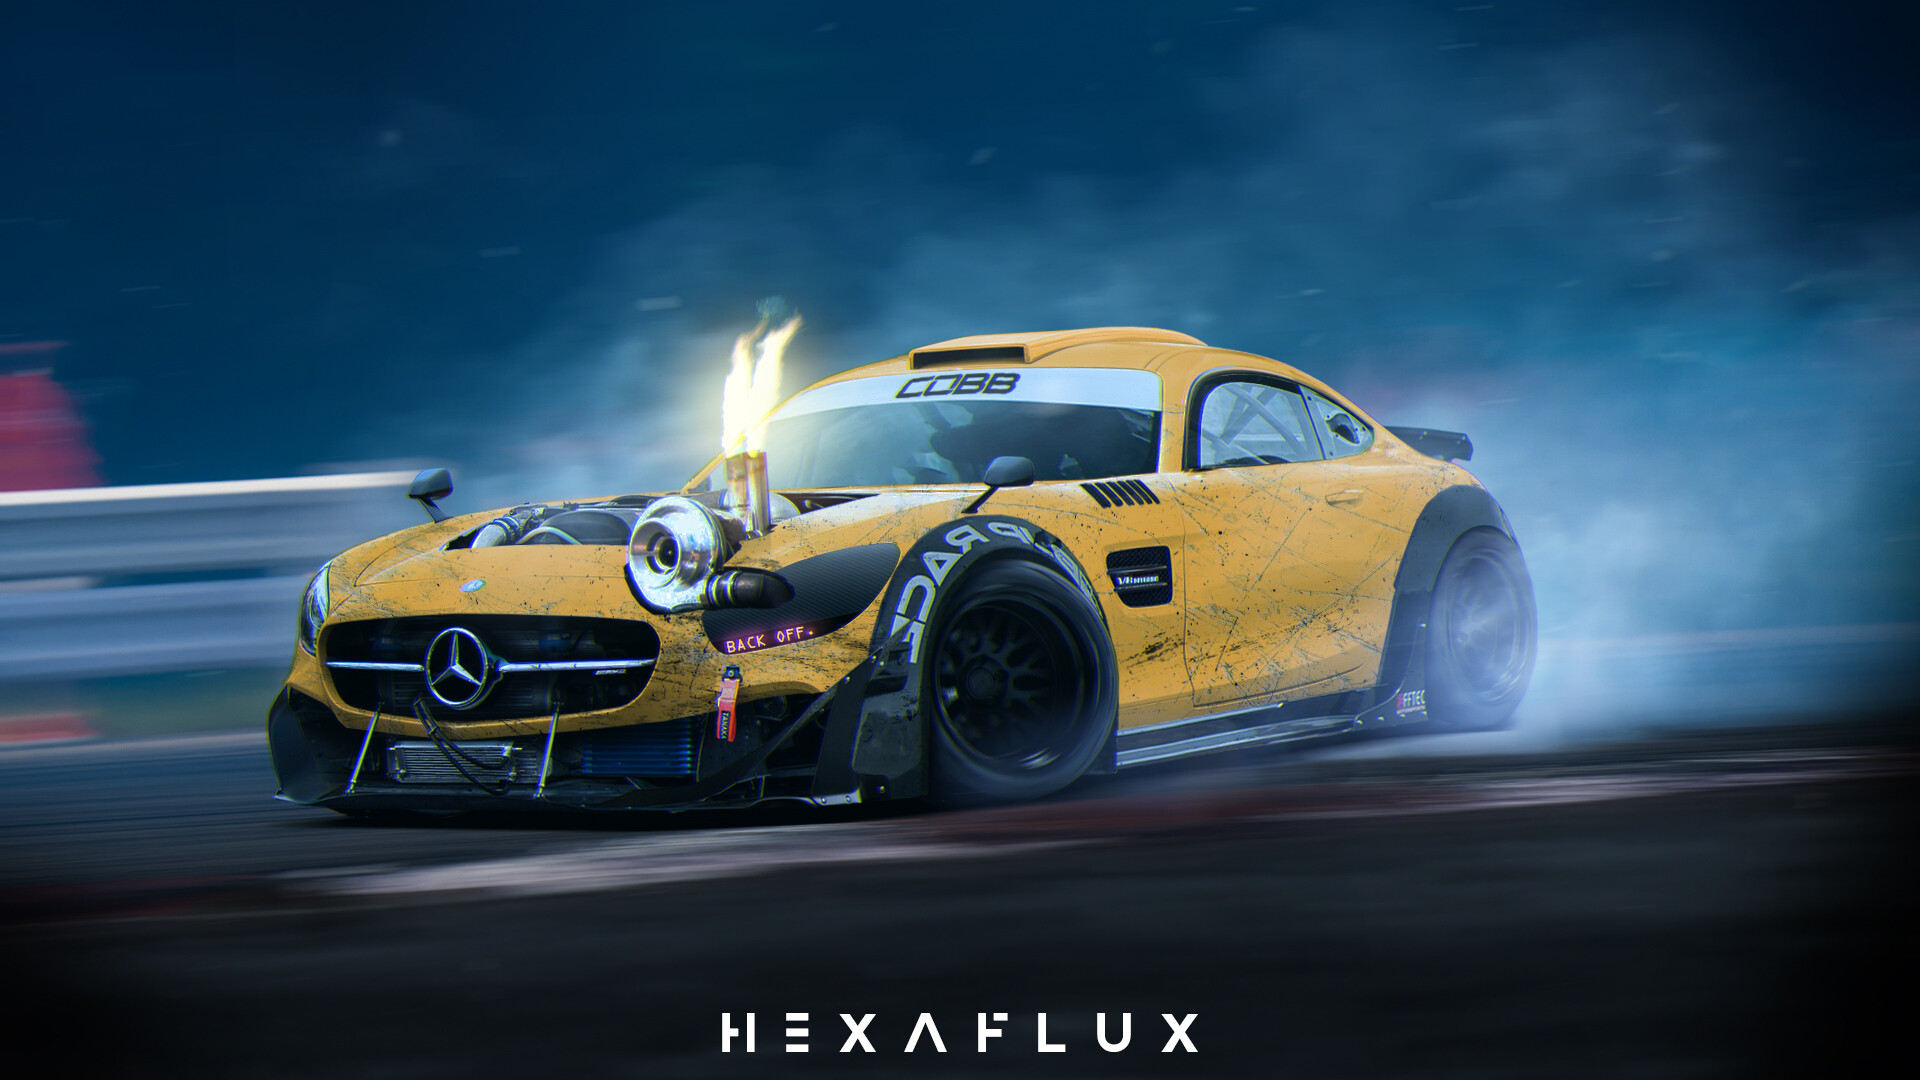 hexaflux-amg-gts-1.jpg